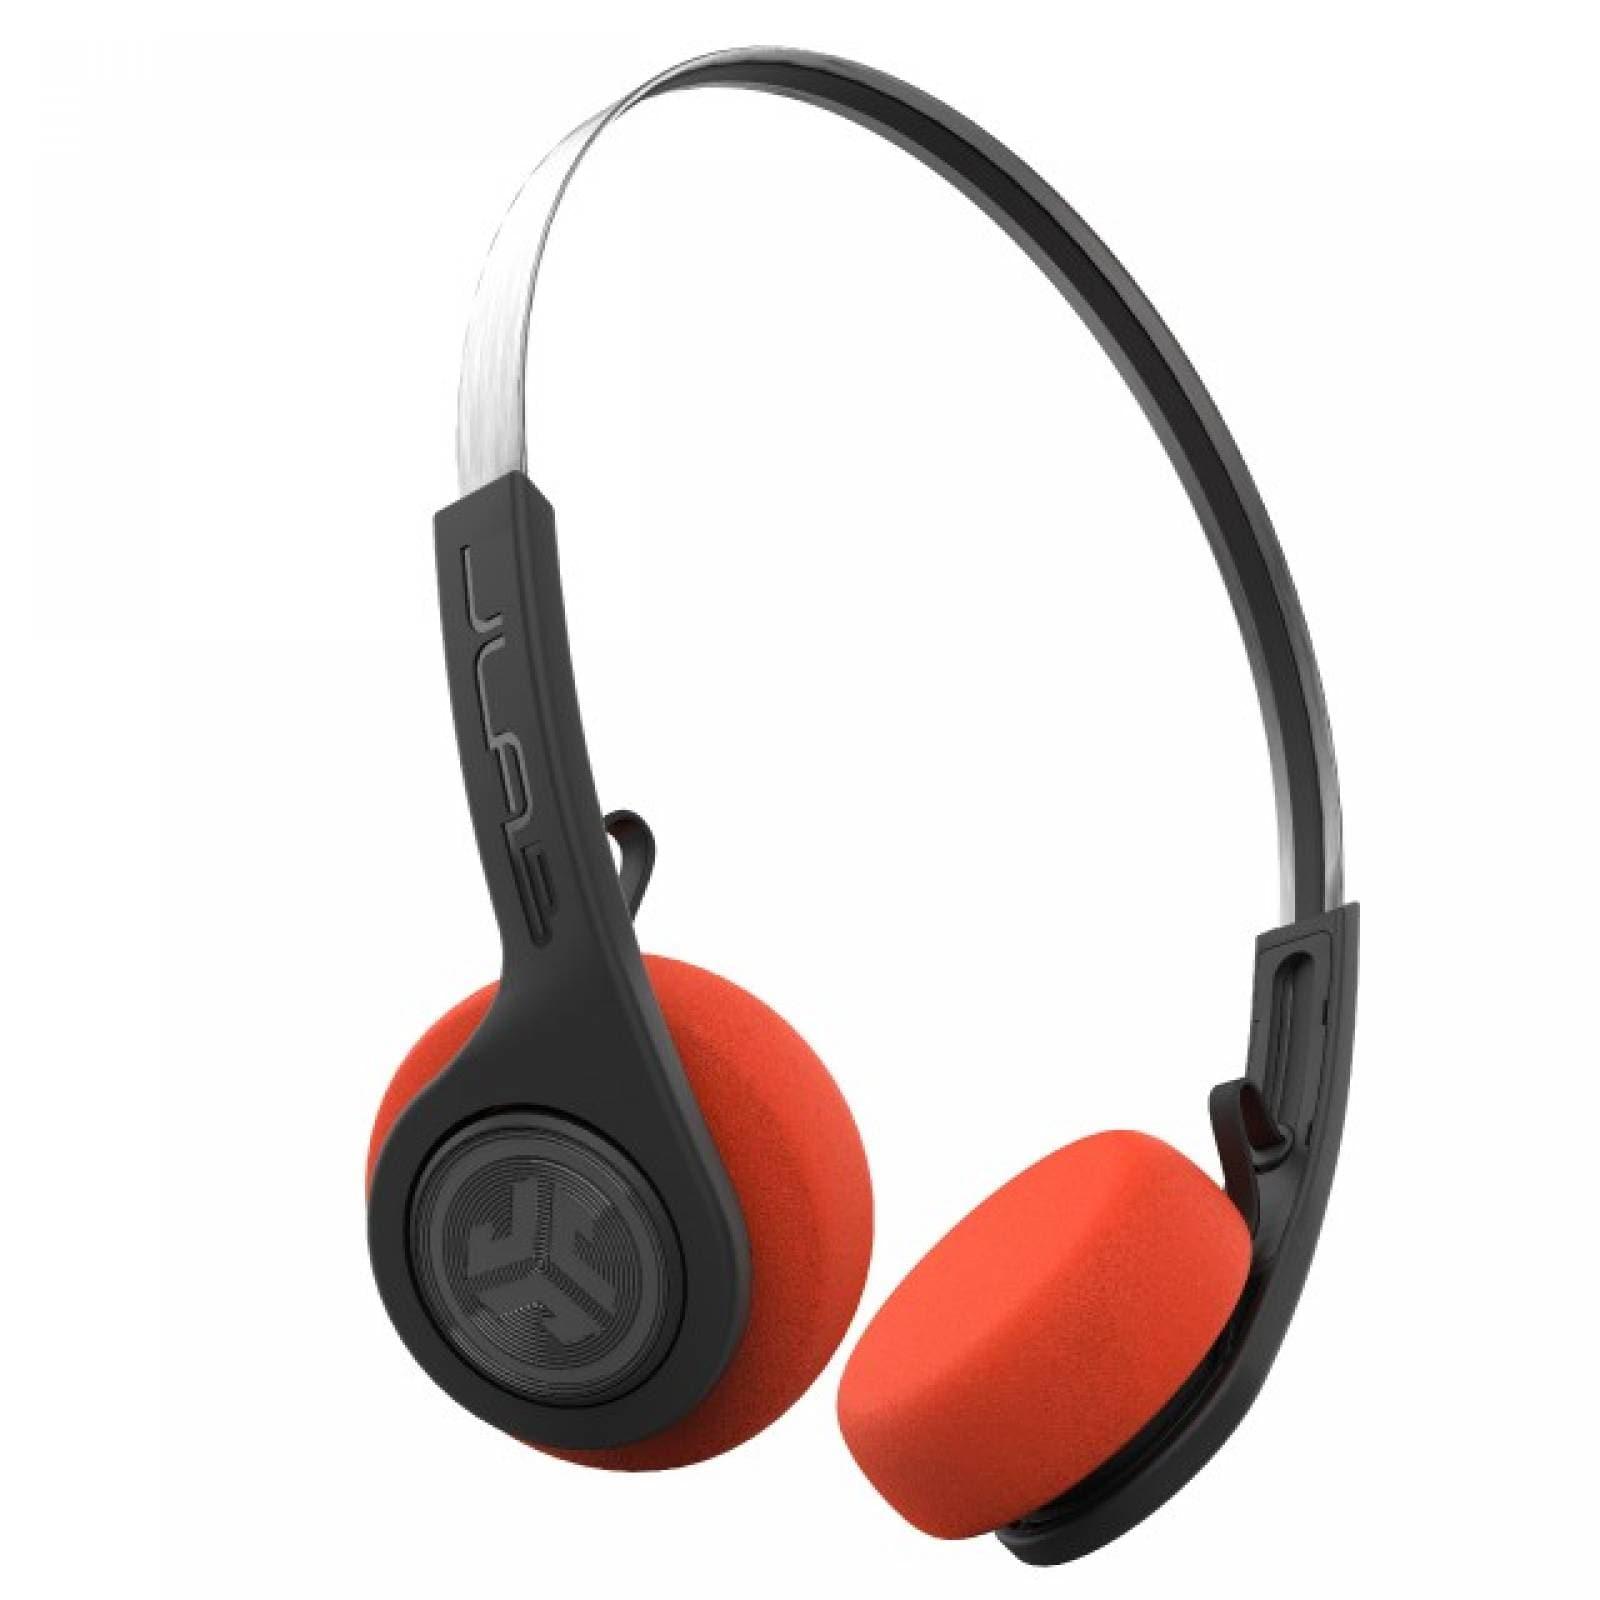 Audífonos Over Ear Bluetooth Rewind negros JLAB